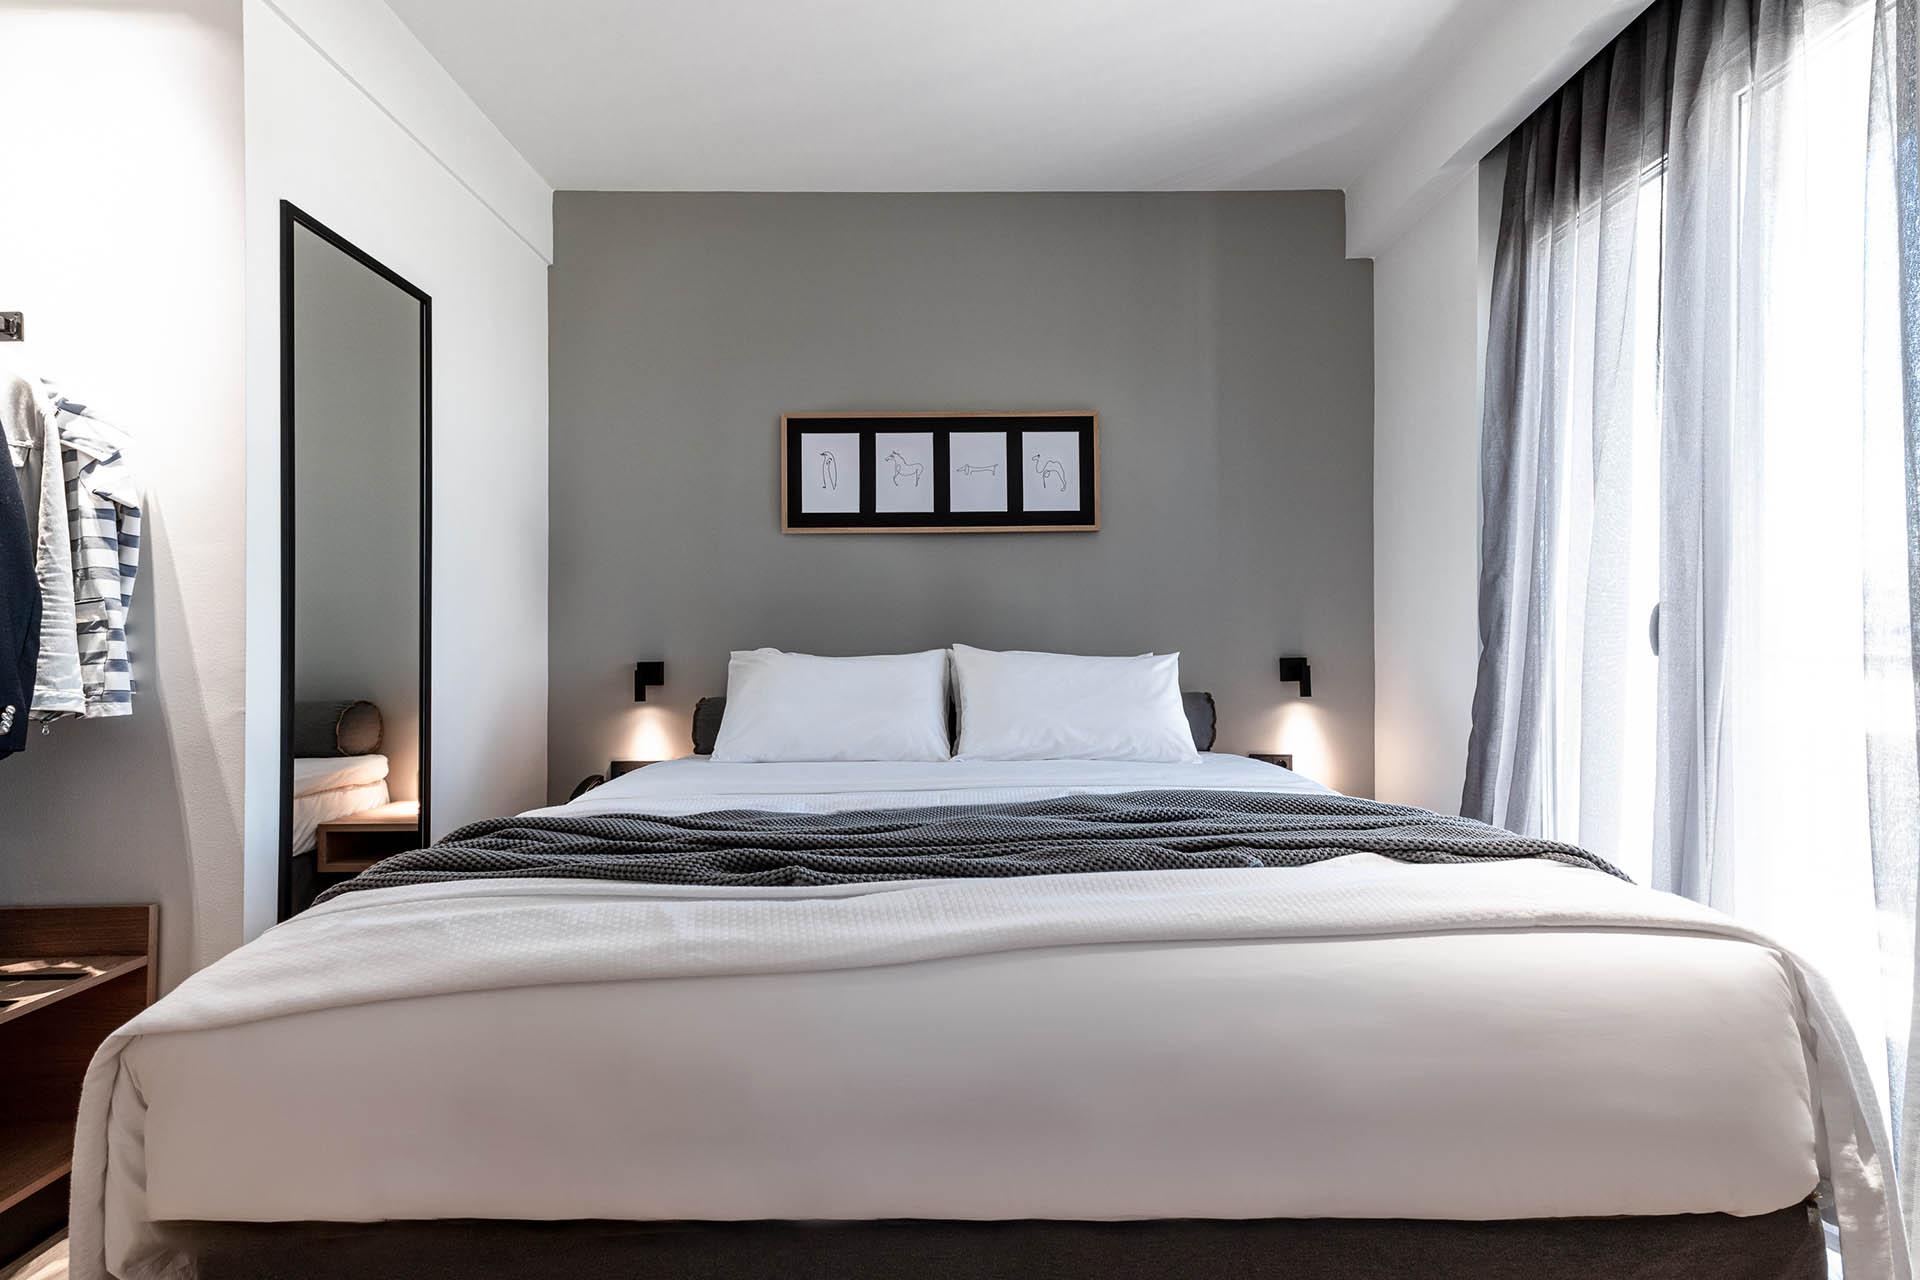 31 Doors Hotel - Αλεξανδρούπολη ✦ 2 Ημέρες (1 Διανυκτέρευση) ✦ 2 άτομα ✦ Πρωινό ✦ Φώτα (03/01/2020 έως 08/01/2021) ✦ Free Wi-Fi